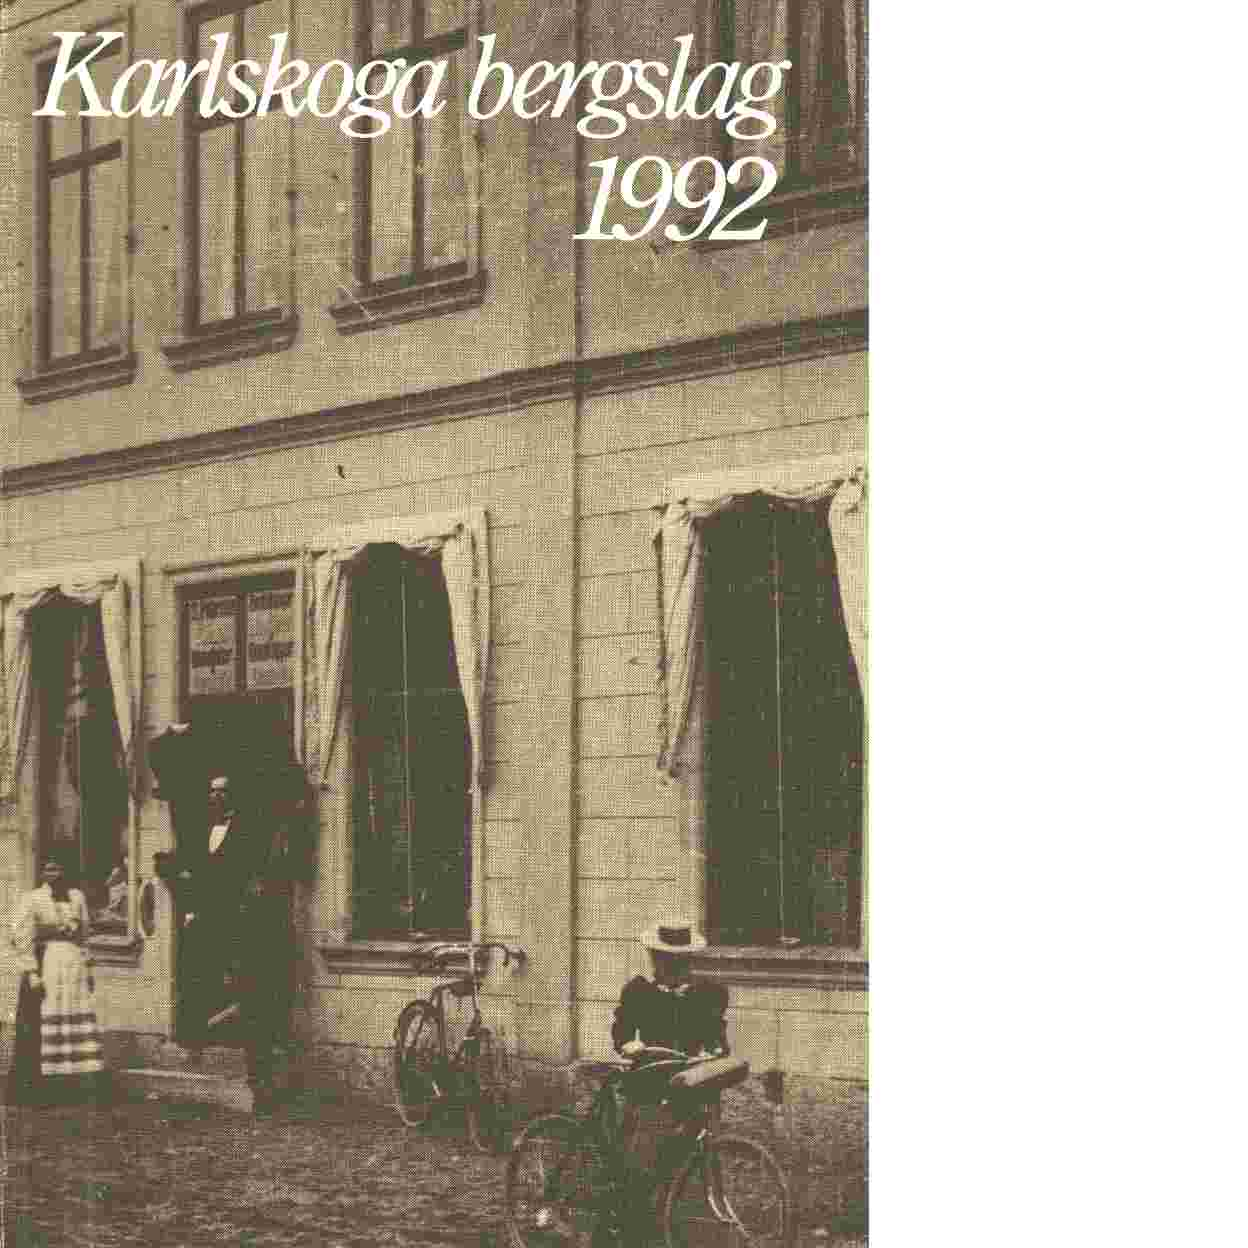 Karlskoga bergslag 1992 / utgiven av Karlskoga bergslags hembygdsförening - Red.